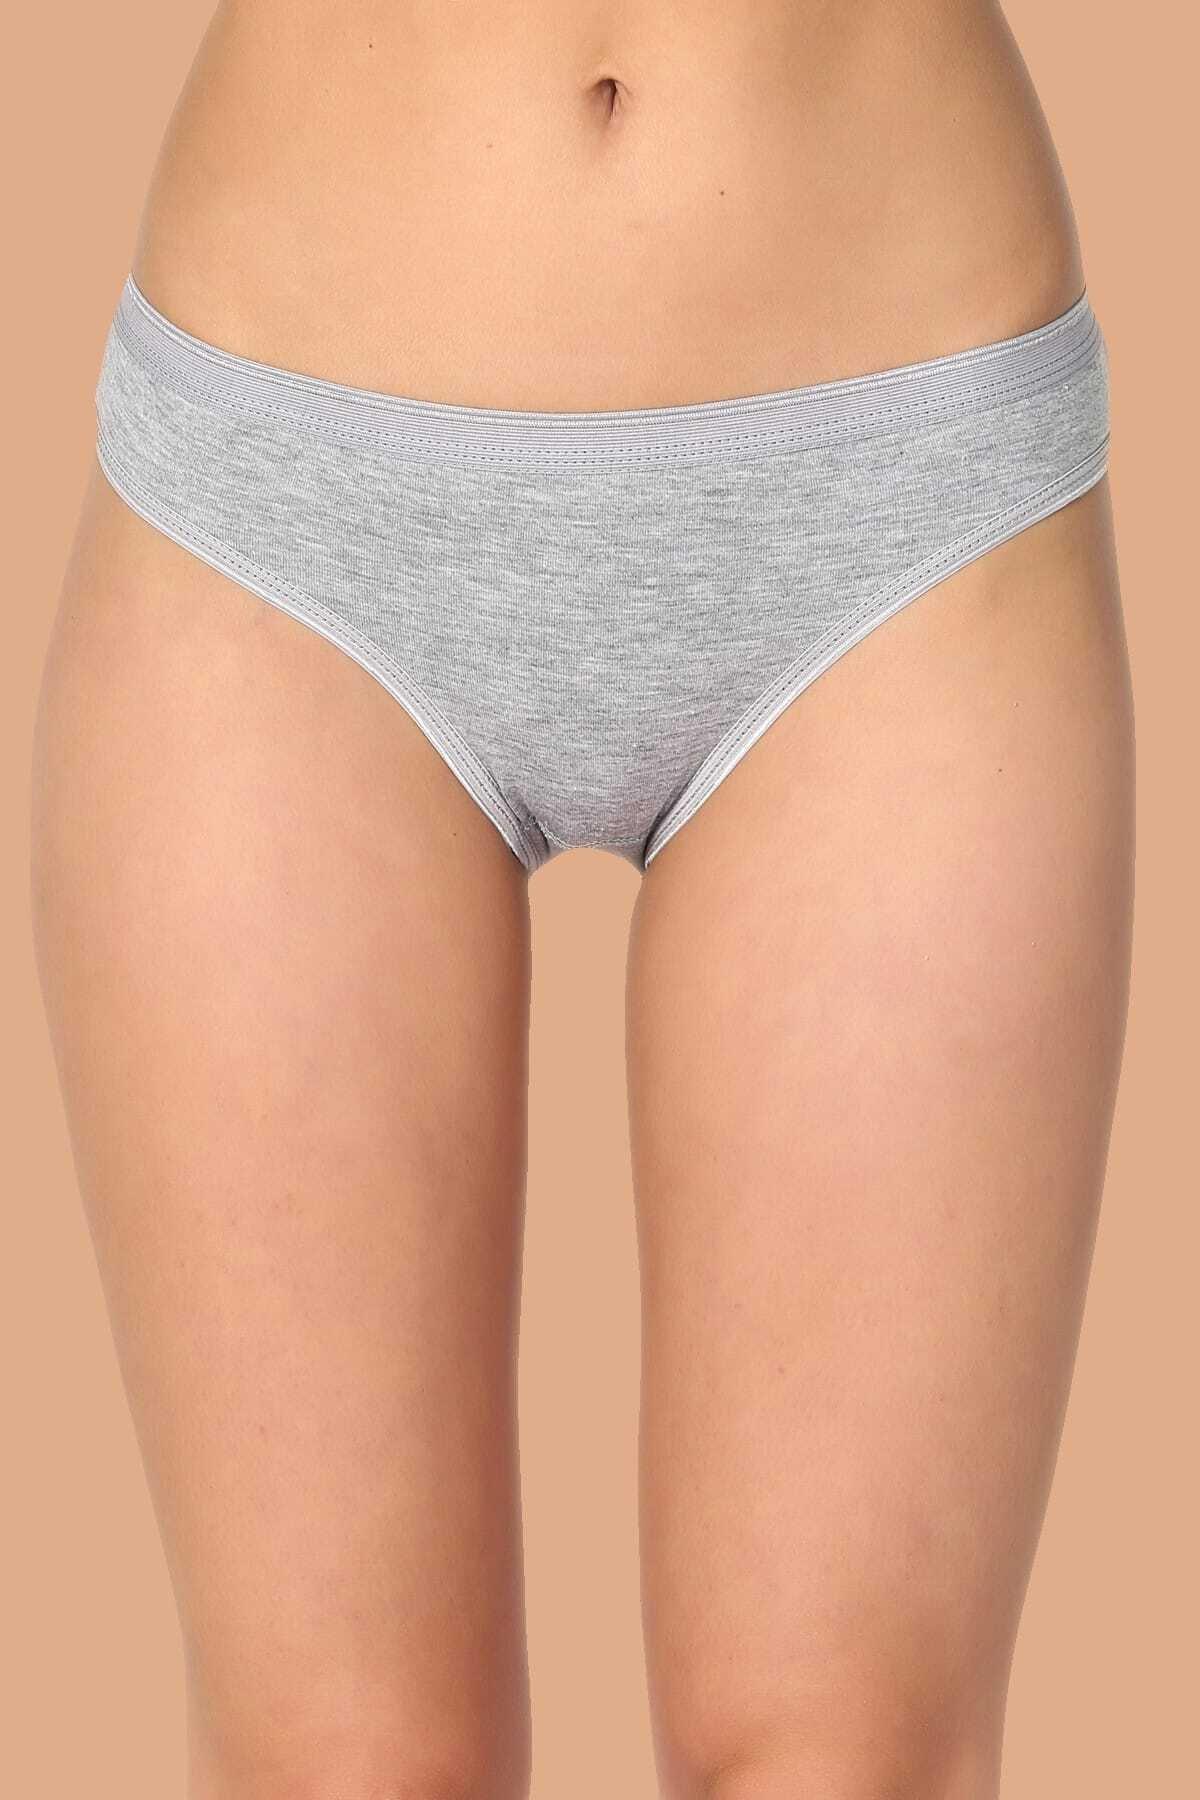 Tutku Kadın Gri 6'lı Paket Pamuklu Su Yolu Bikini Külot 1